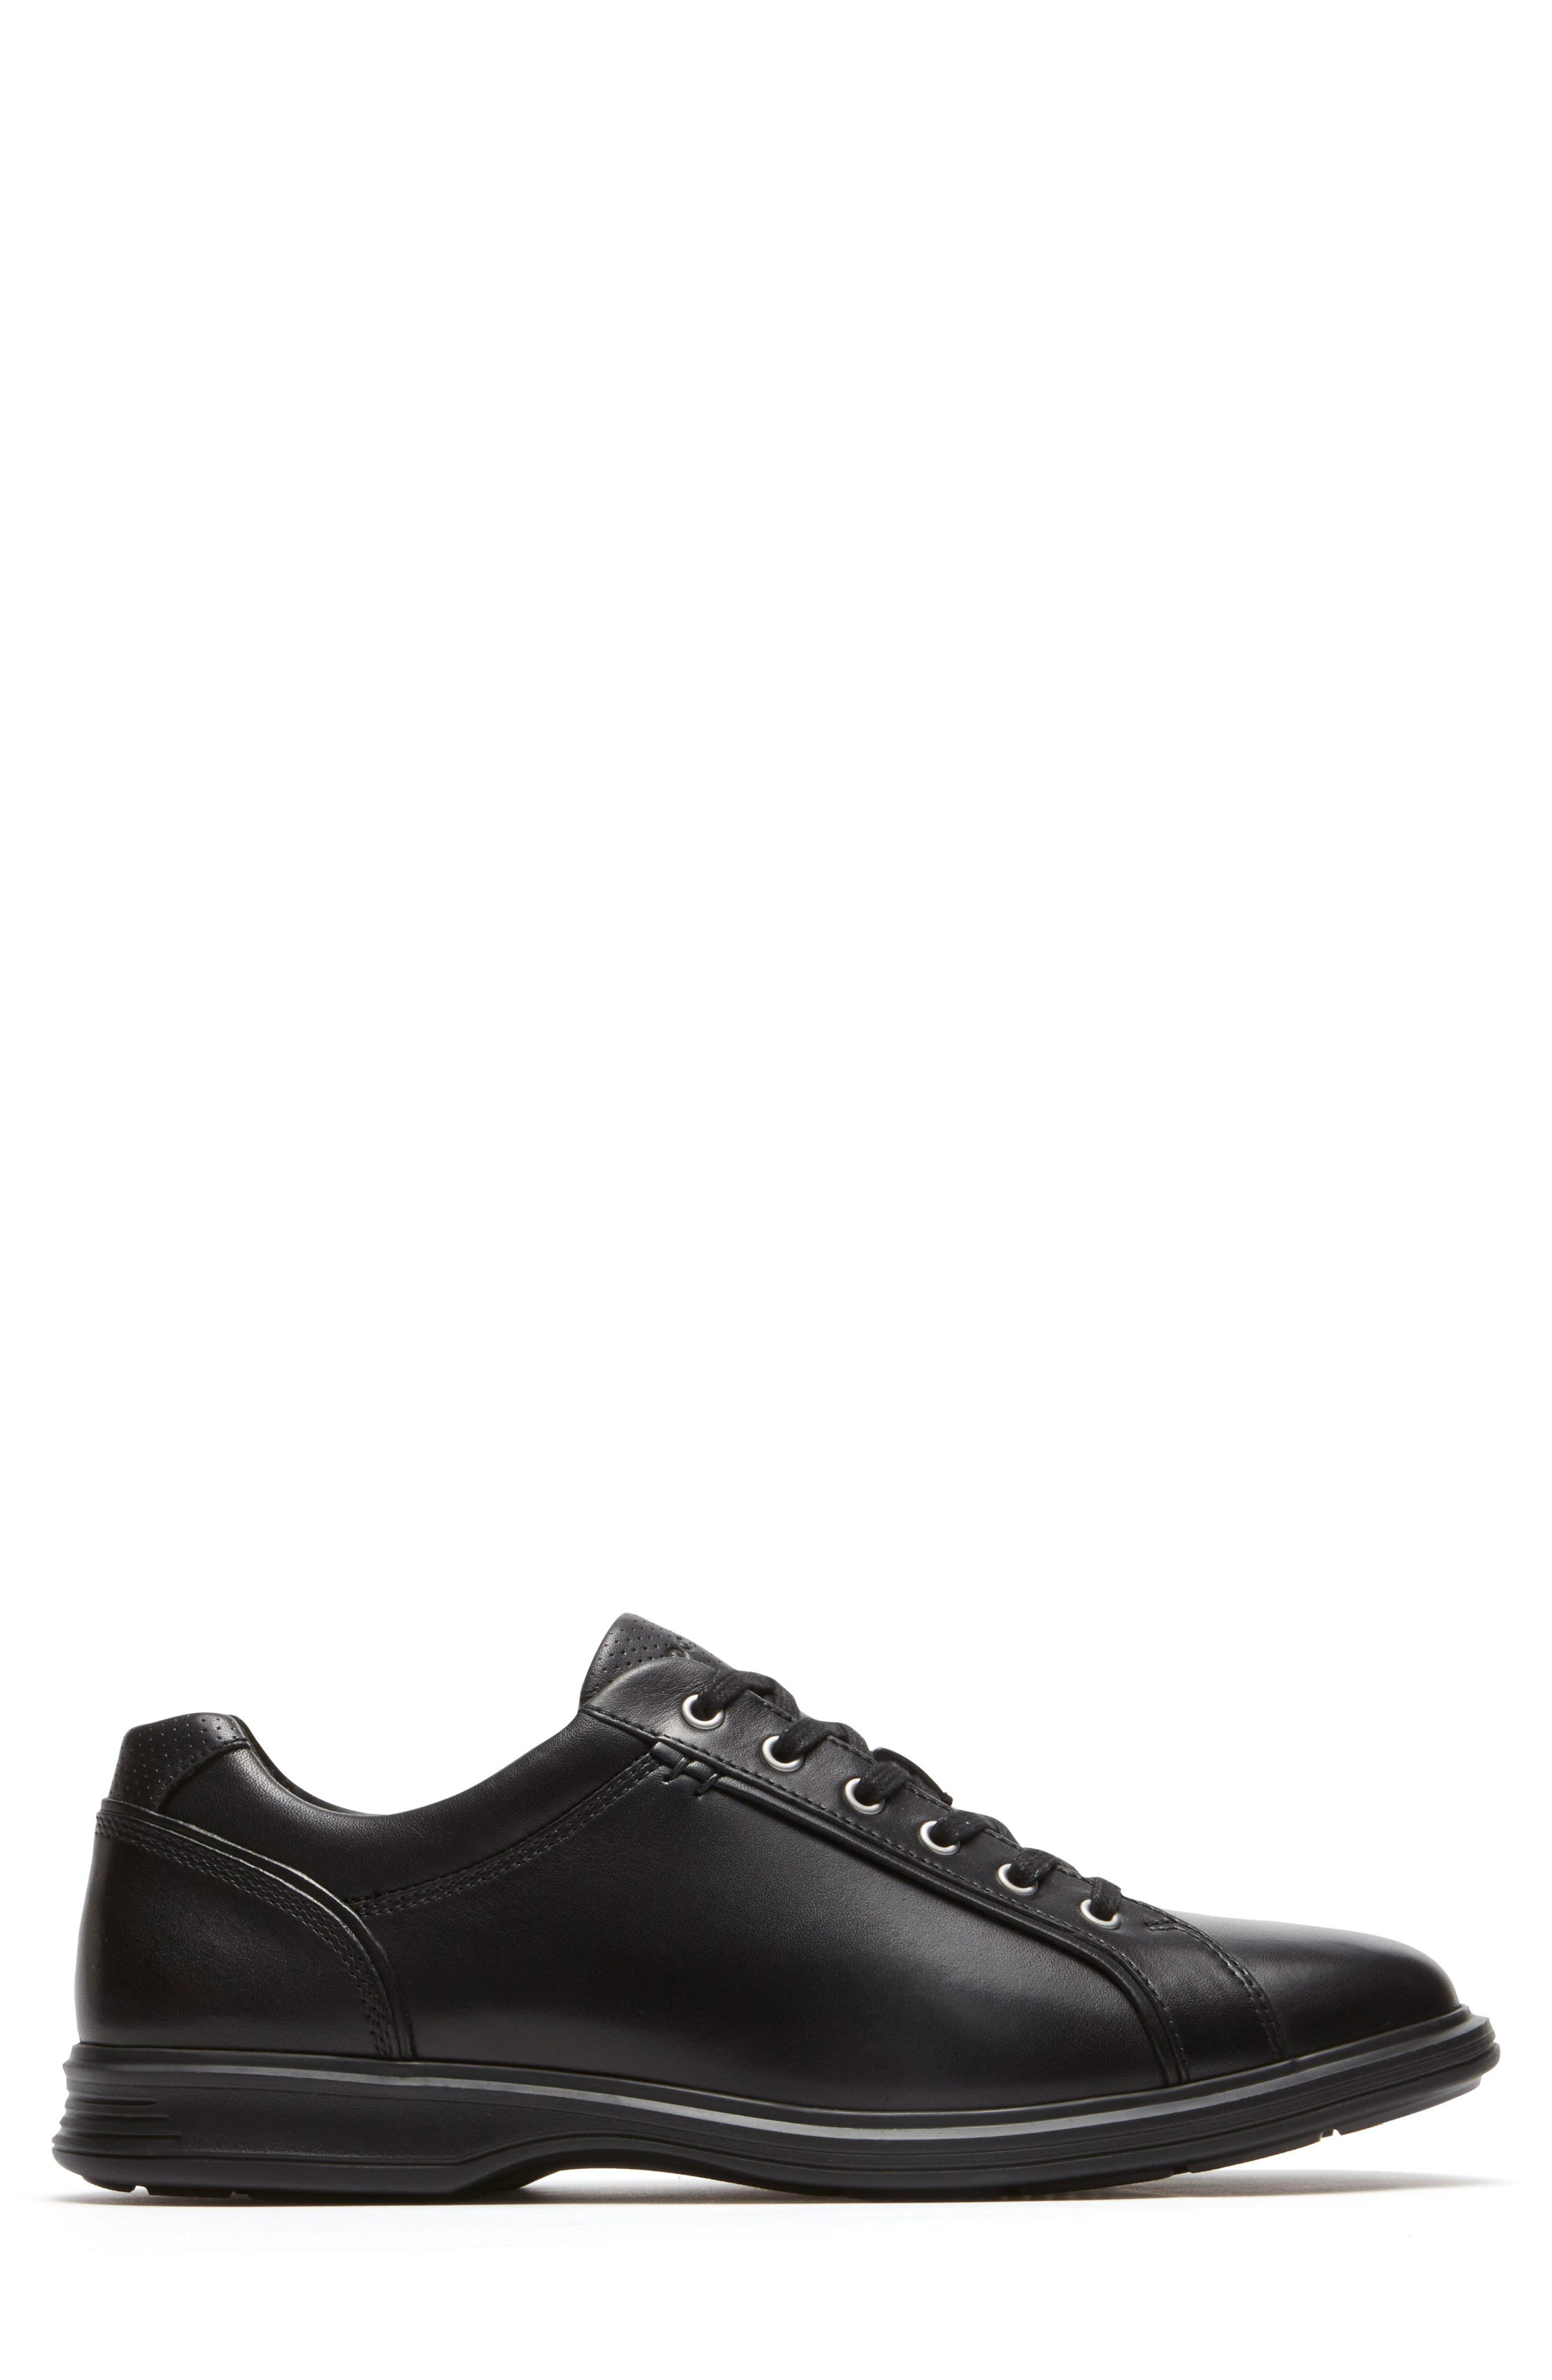 Dressports 2 Lite Plain Toe Derby,                             Alternate thumbnail 3, color,                             Black 2 Leather